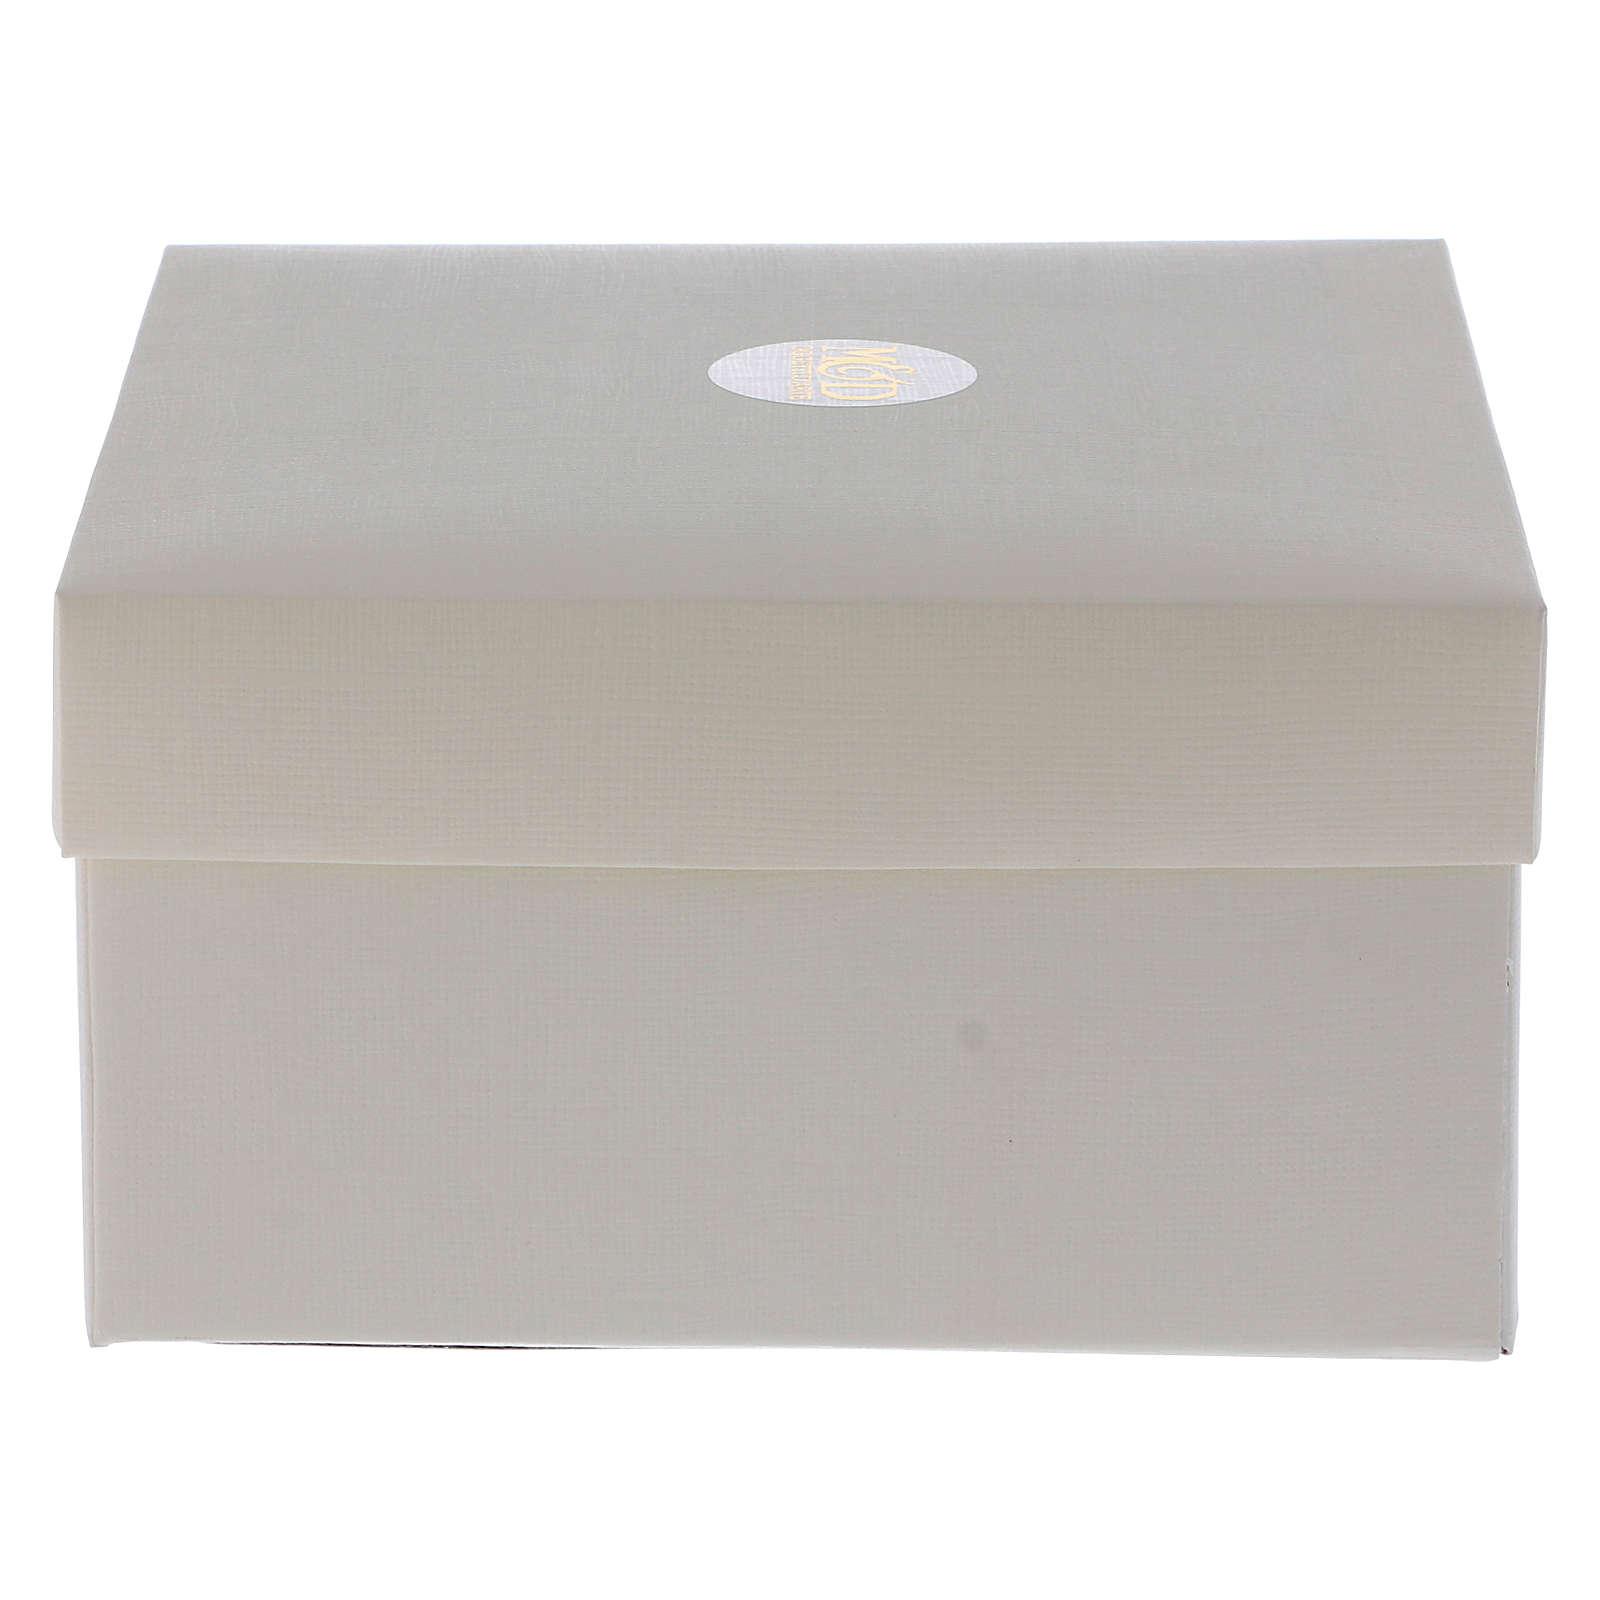 Bombonera caja Comunión 5x5x5 cm 3